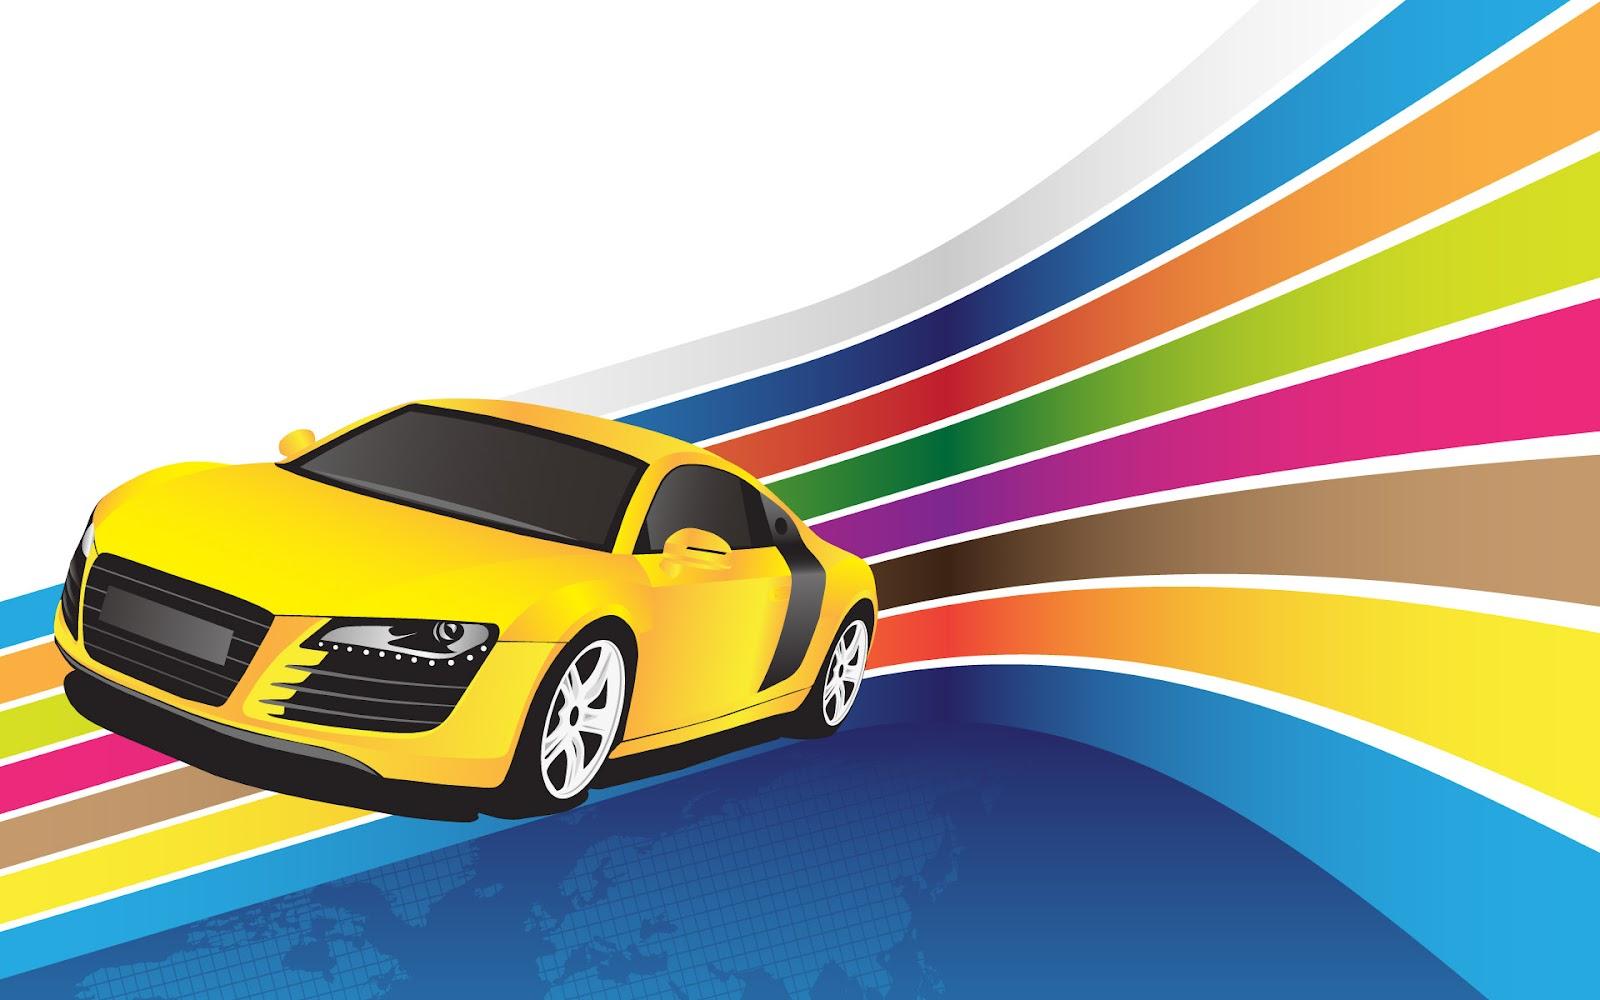 Racing cars cartoon wallpapers mobile wallpapers - Racing cars wallpapers for mobile ...